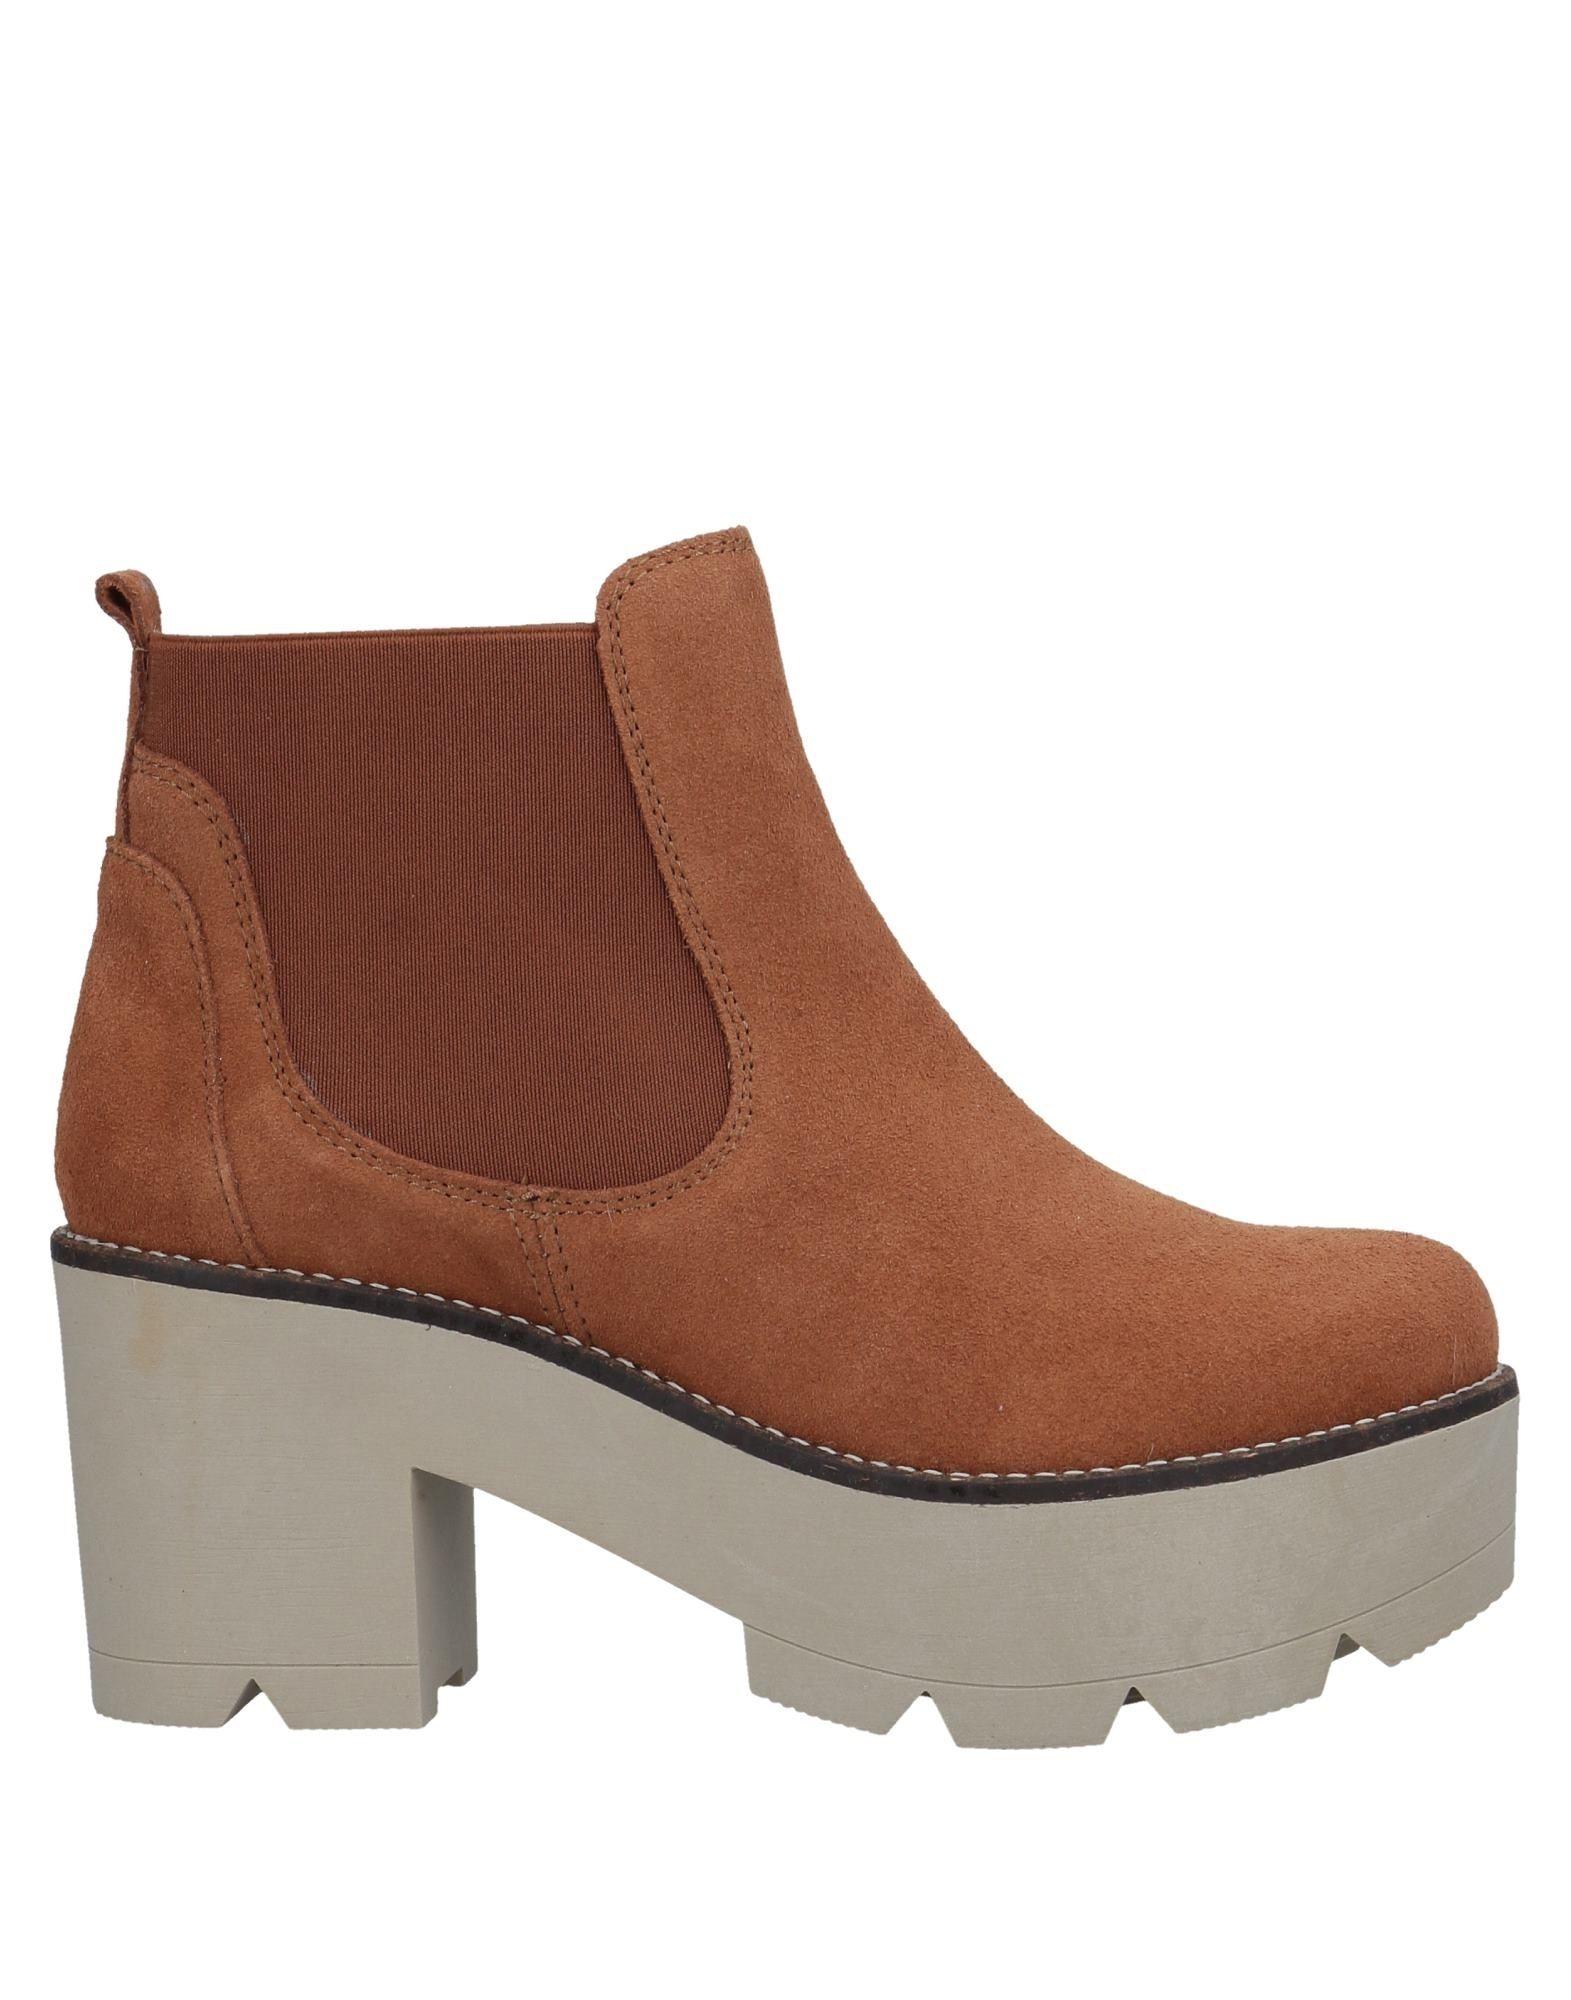 Flavio Creation Chelsea Boots Damen  11547567BD Gute Qualität beliebte Schuhe